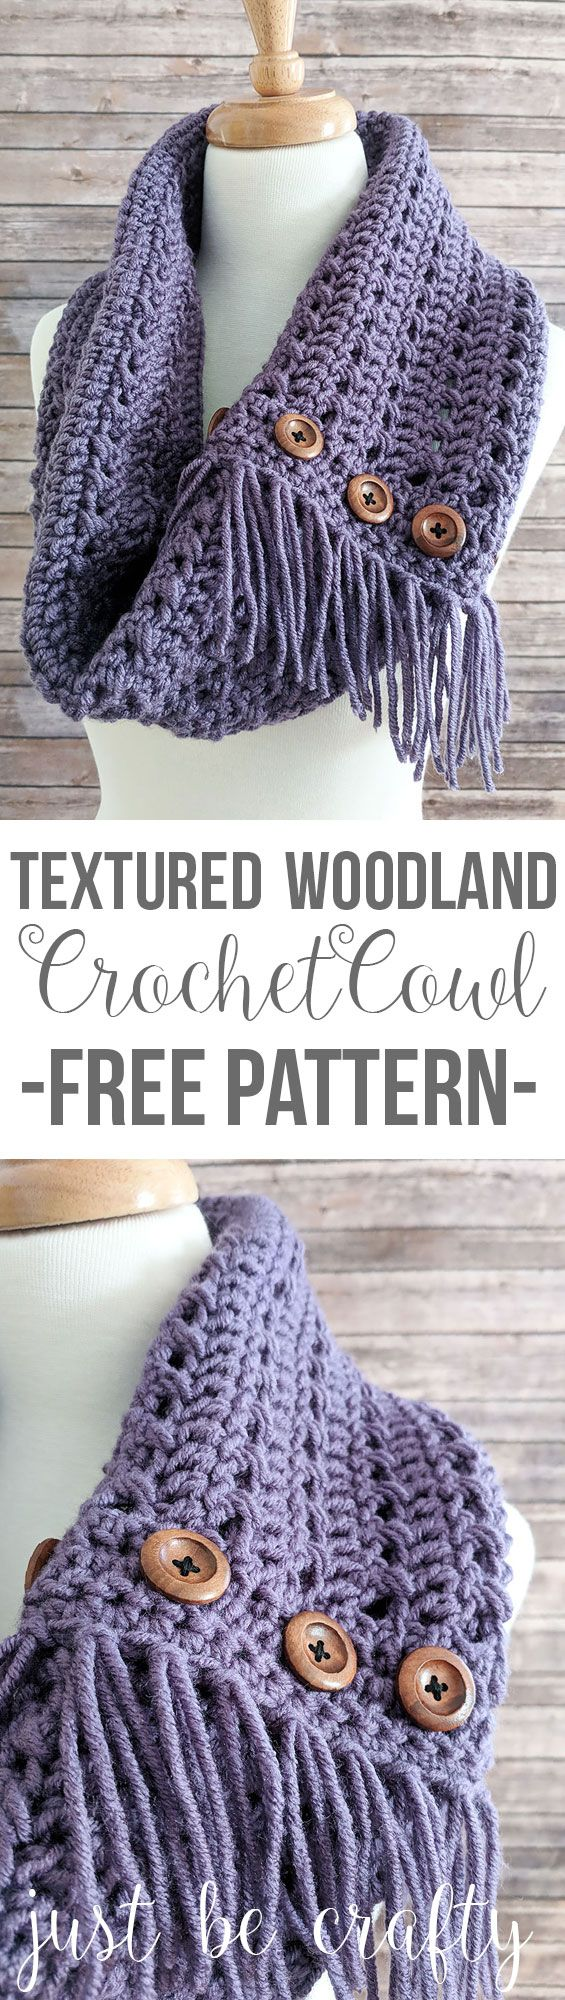 Textured Woodland Crochet Cowl Pattern - Free Pattern by | Tejido ...